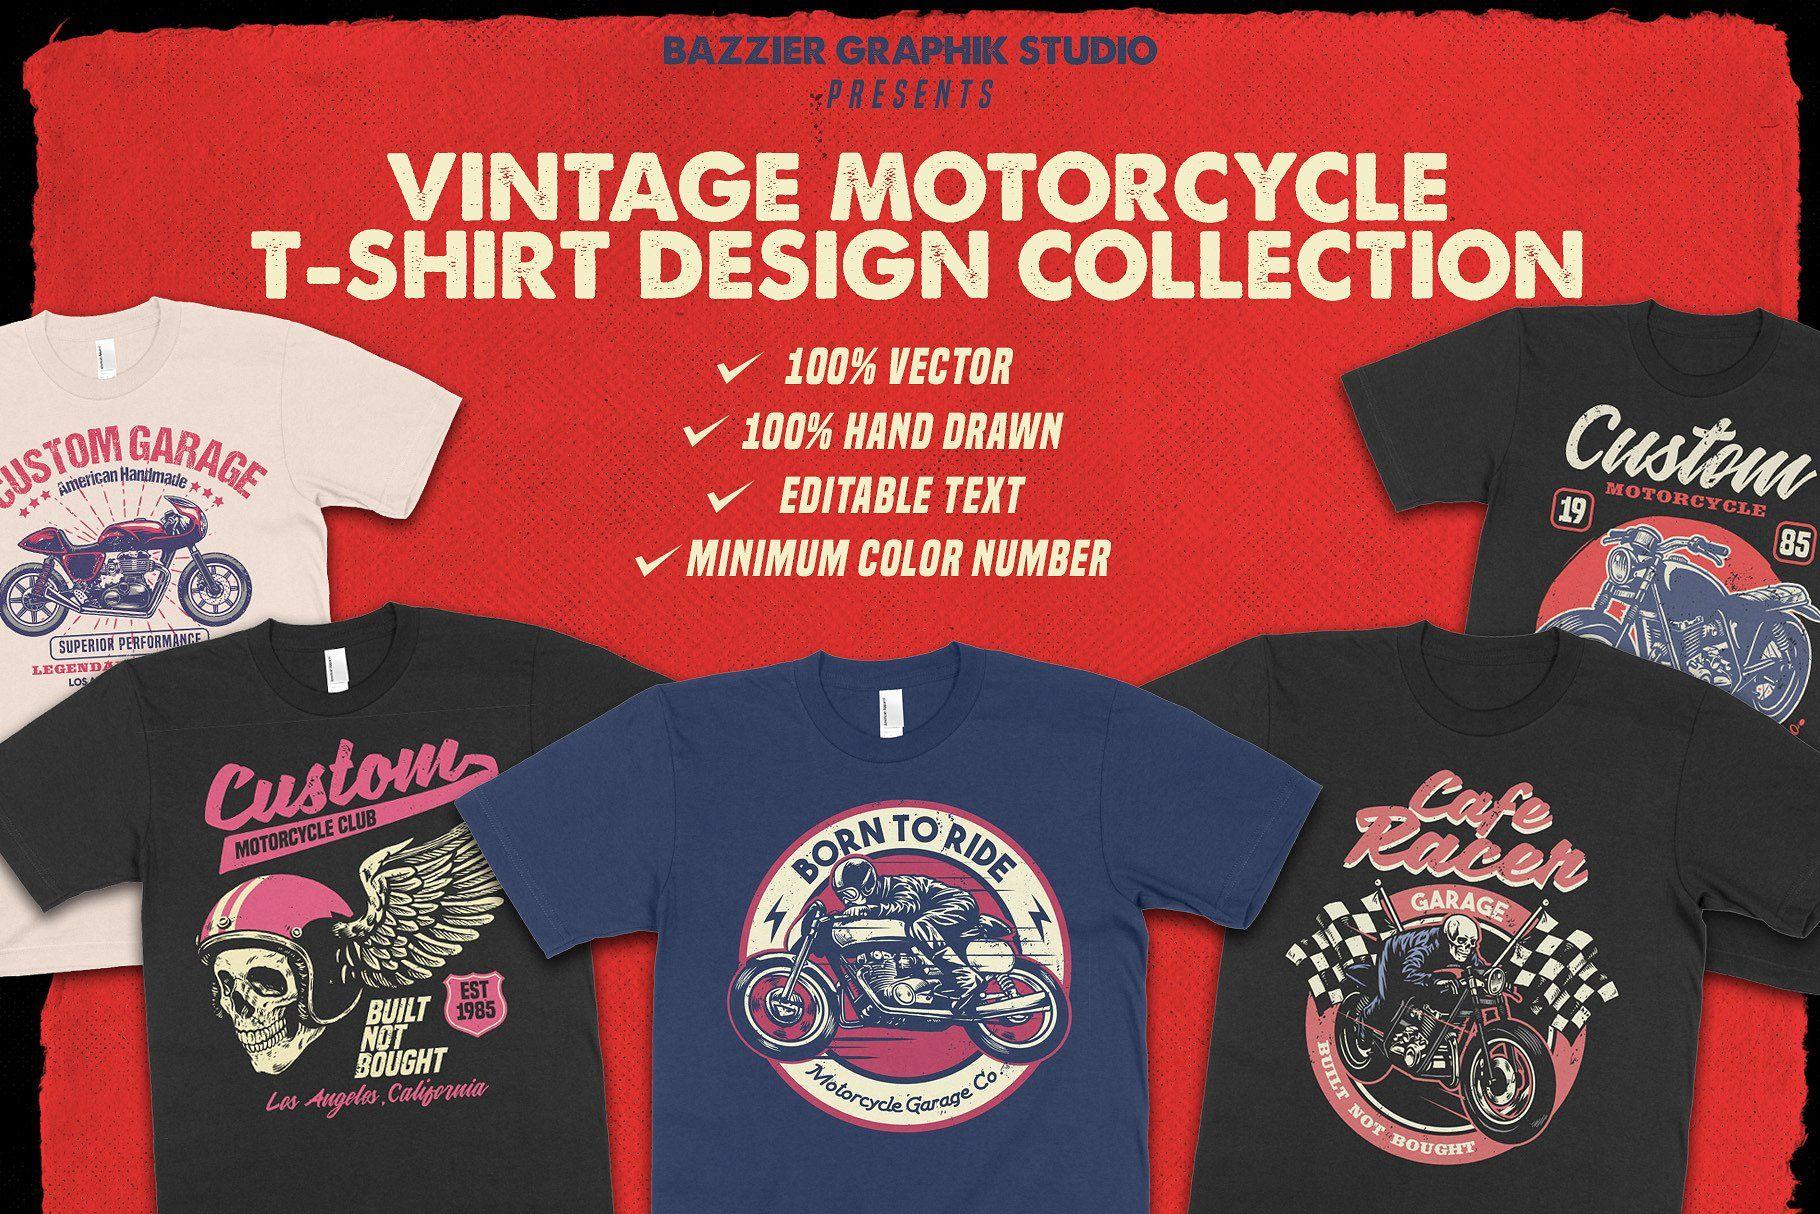 Vintage Motorcycle T Shirt Design Tshirt Designs Shirt Designs Motorcycle Tshirts